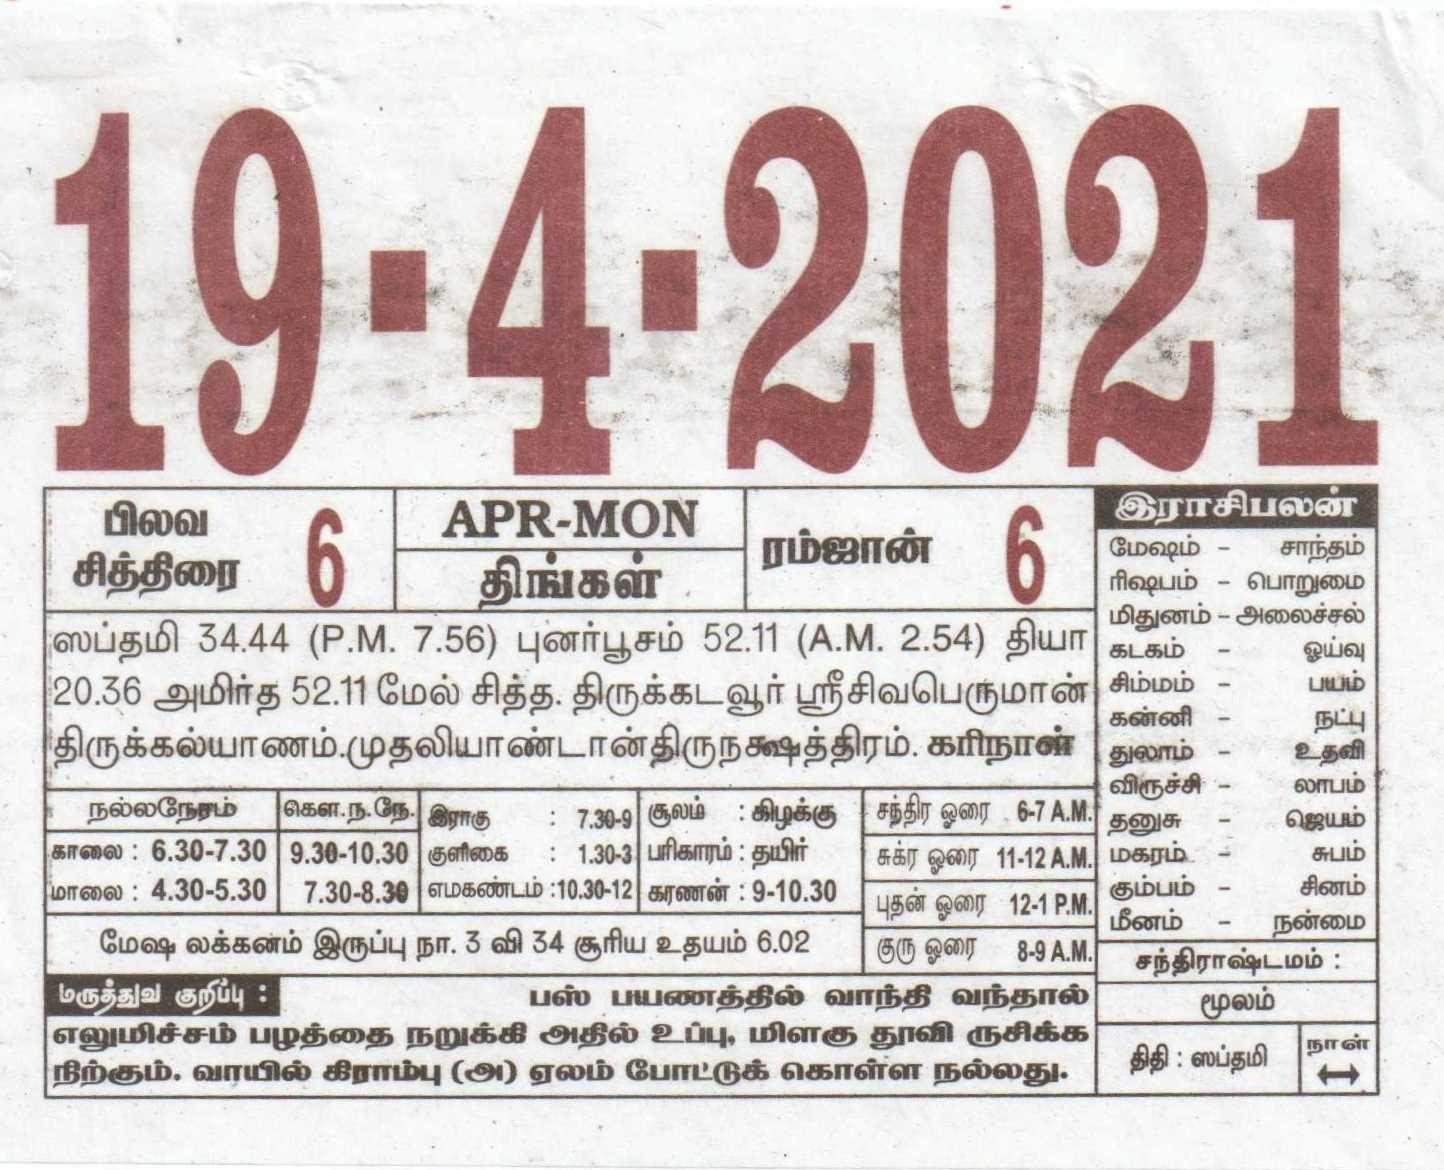 19-04-2021 Daily Calendar | Date 19 , January Daily Tear Off Calendar | Daily Panchangam Rasi Palan August 2021 Tamil Daily Calendar